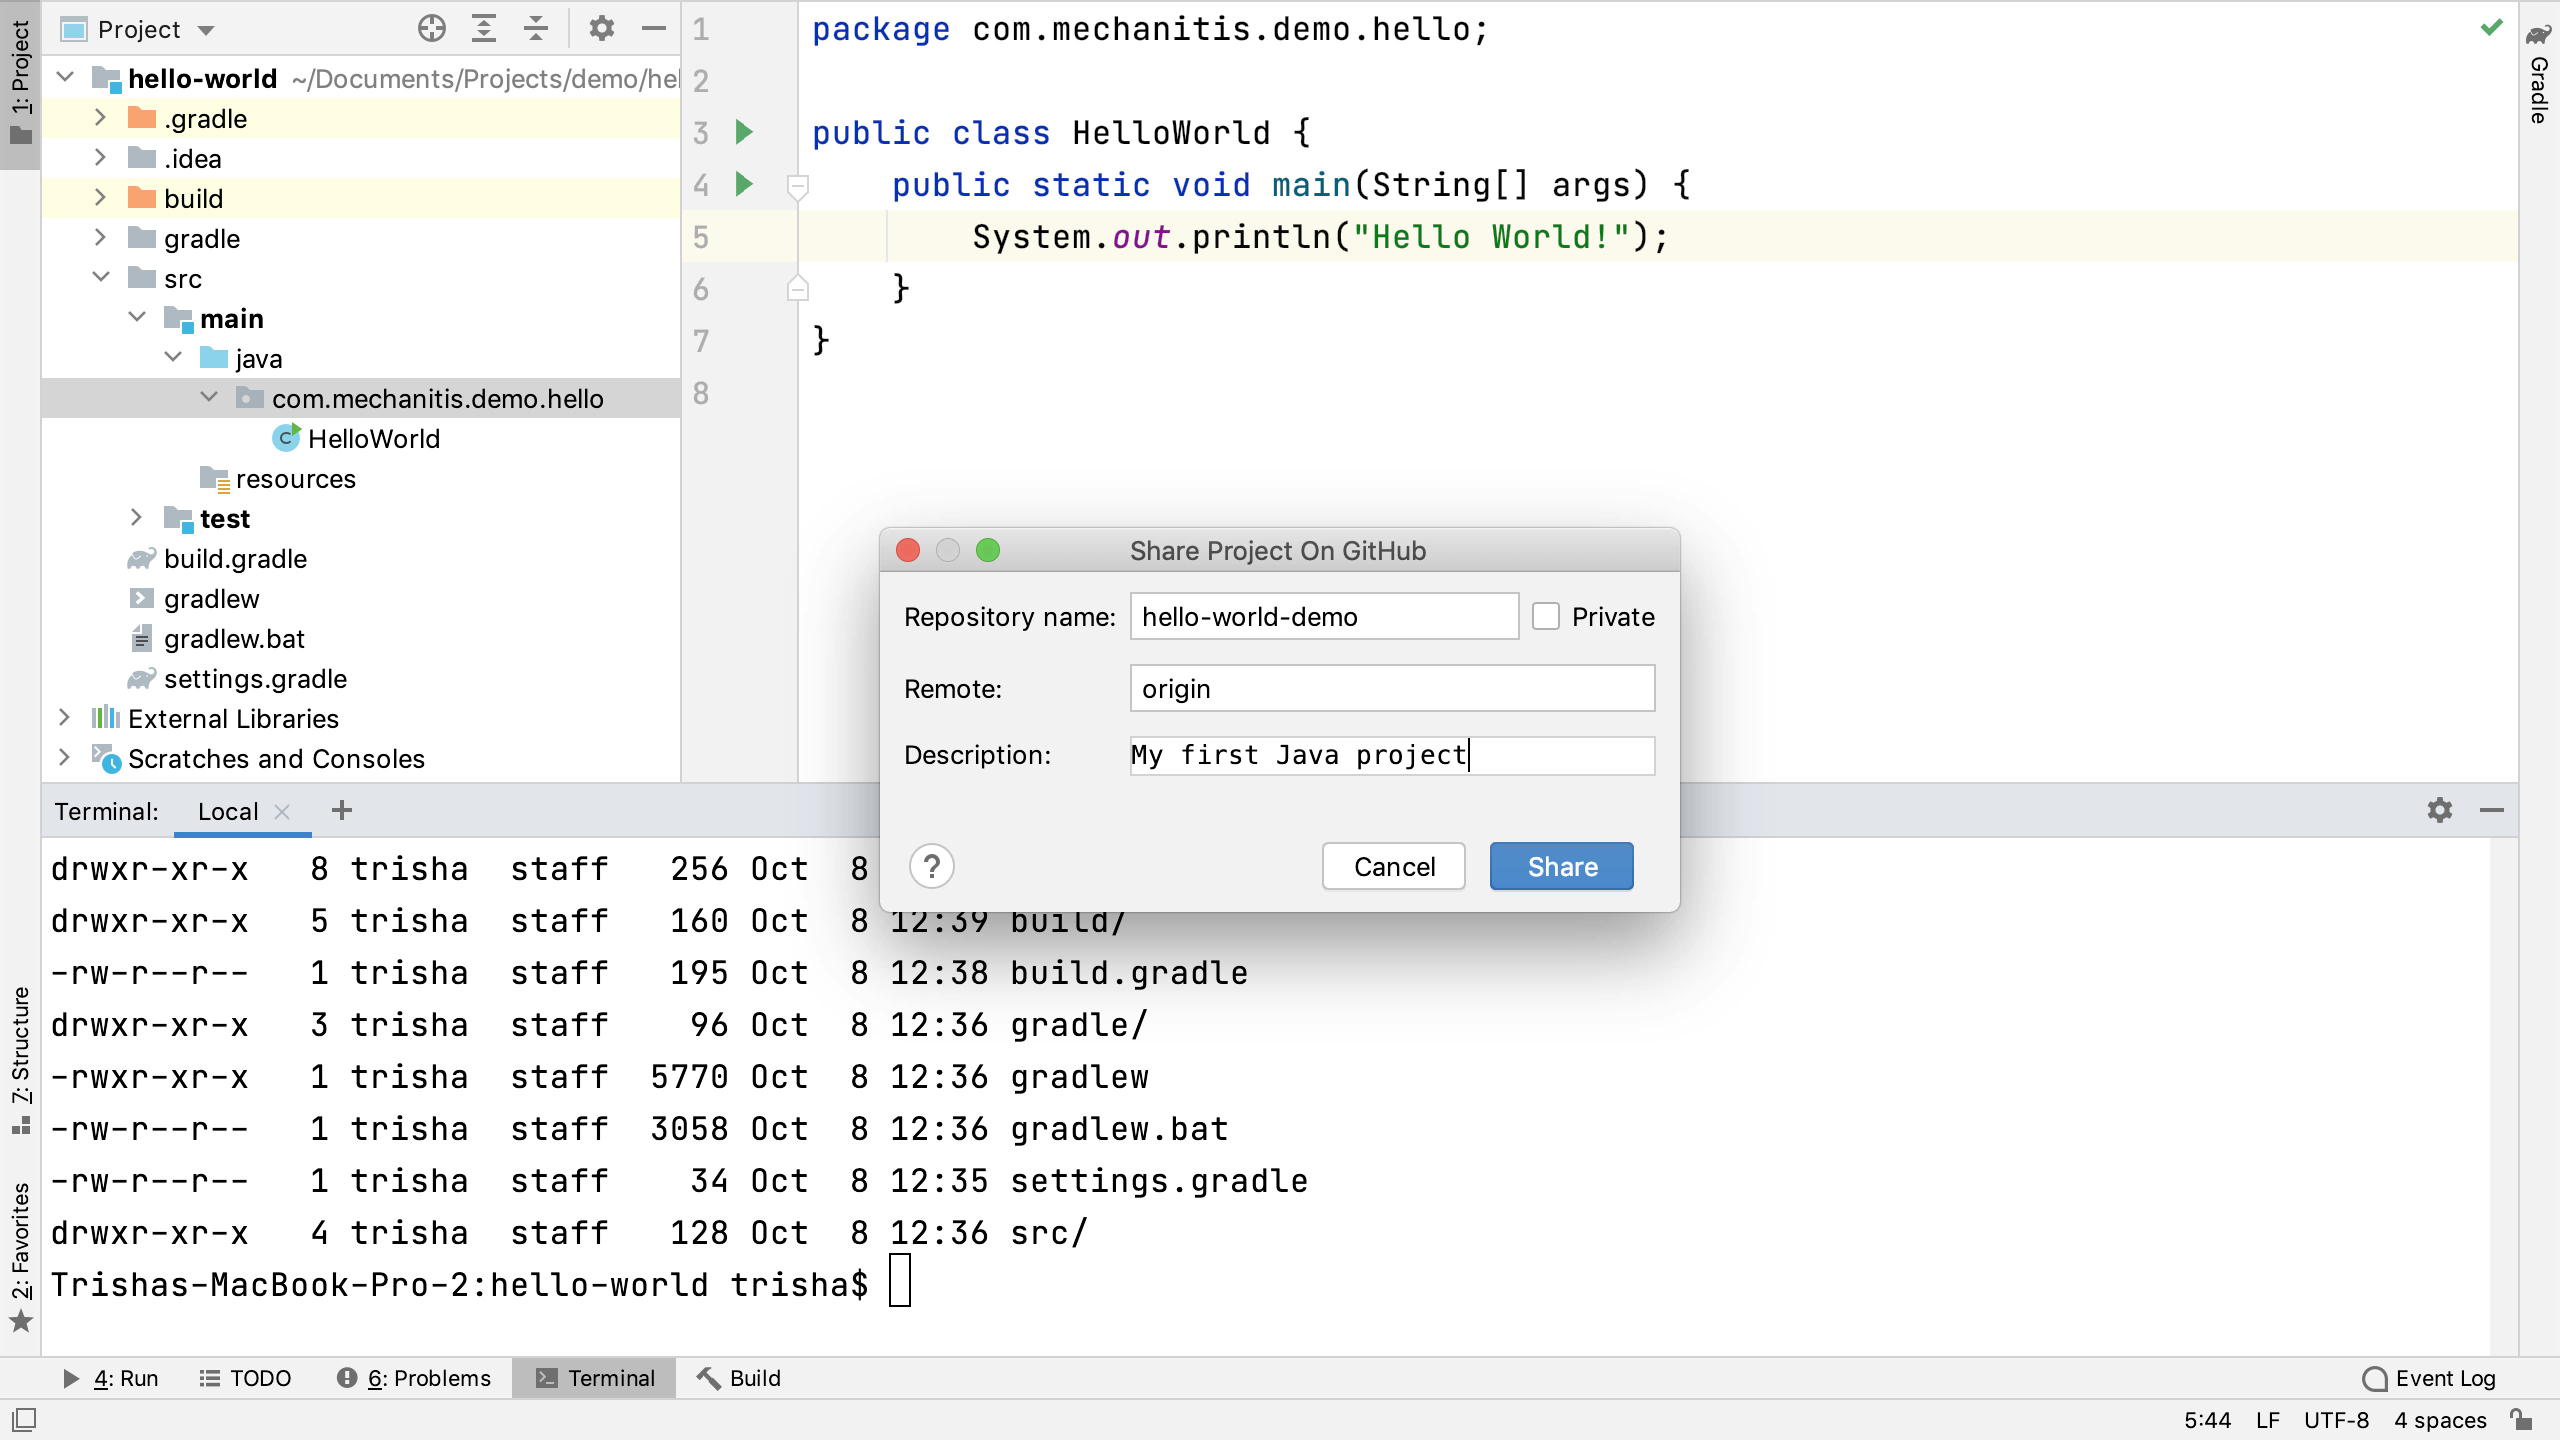 Share Project on GitHub Window